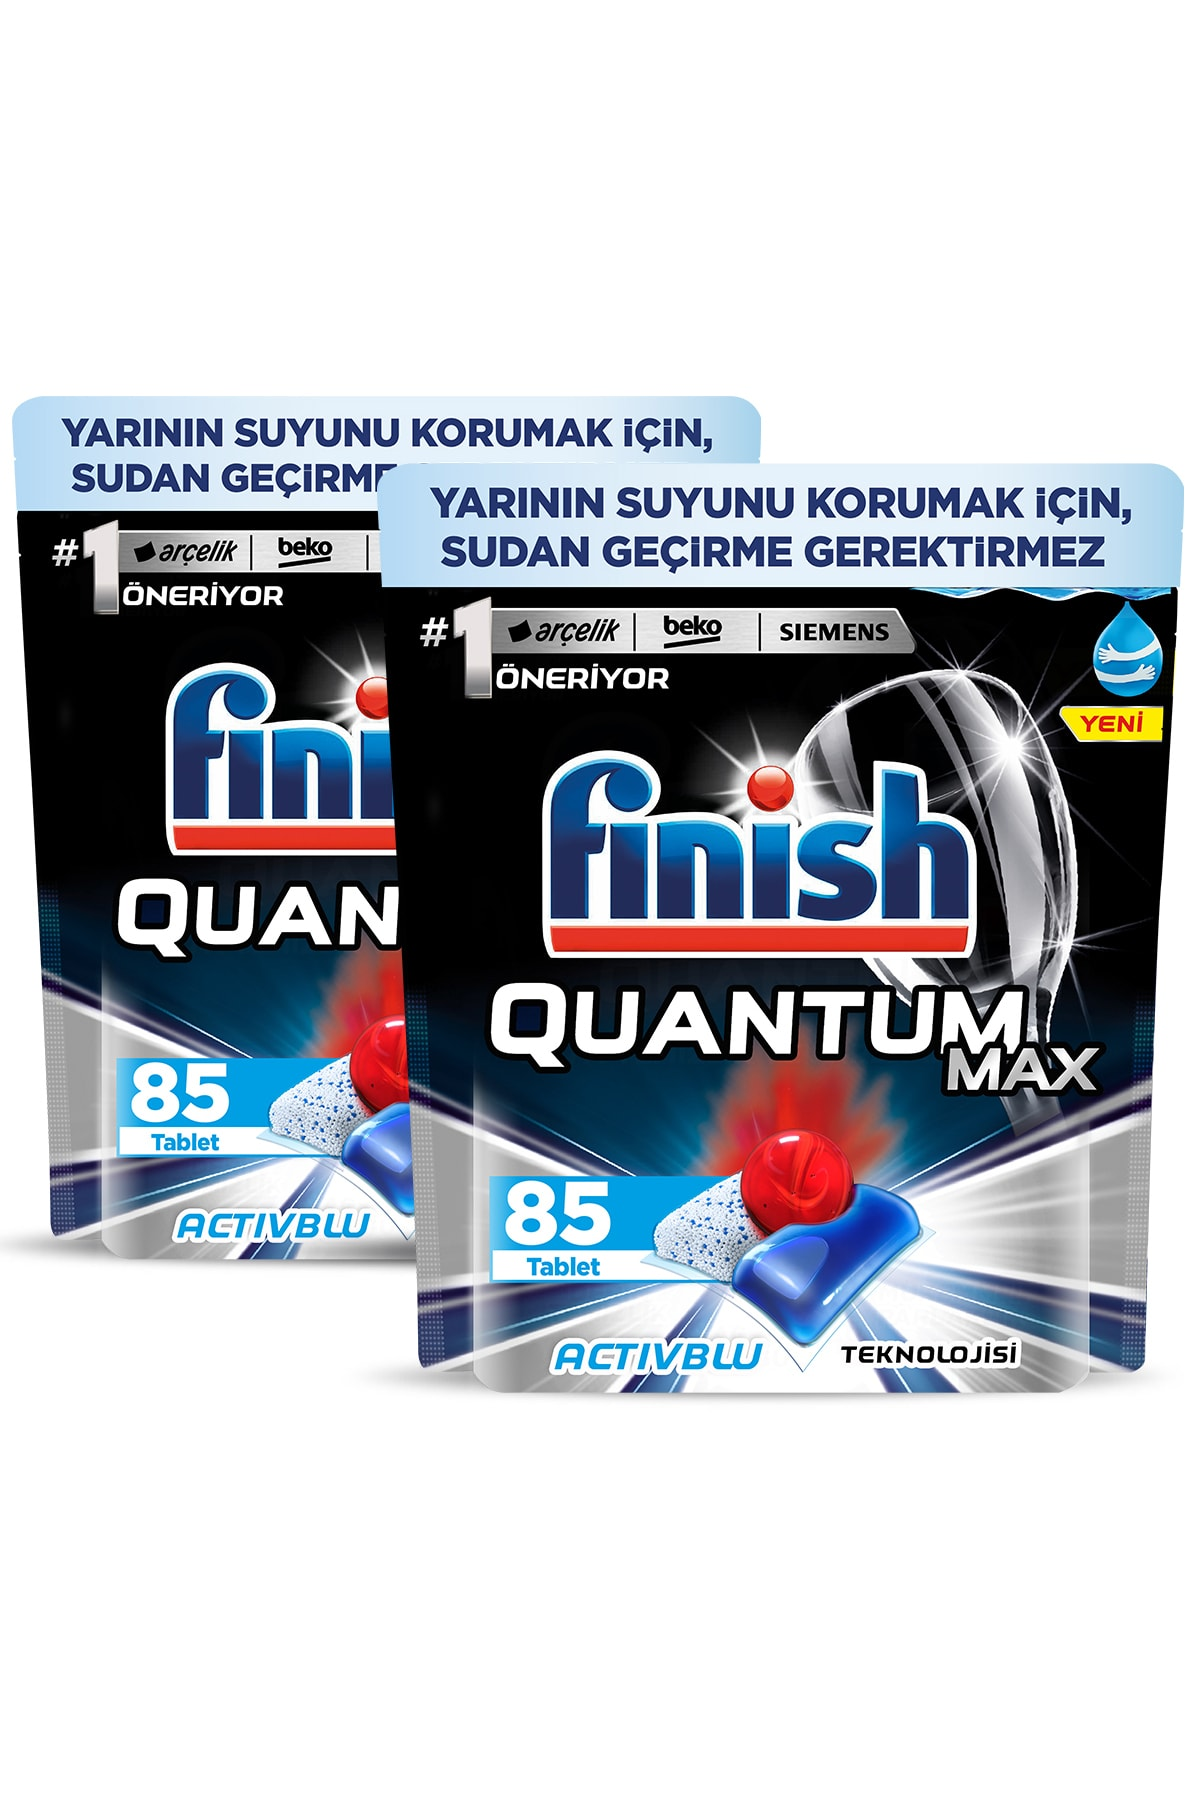 Finish Quantum Max 170 Kapsül Bulaşık Makinesi Deterjanı (85x2) 2